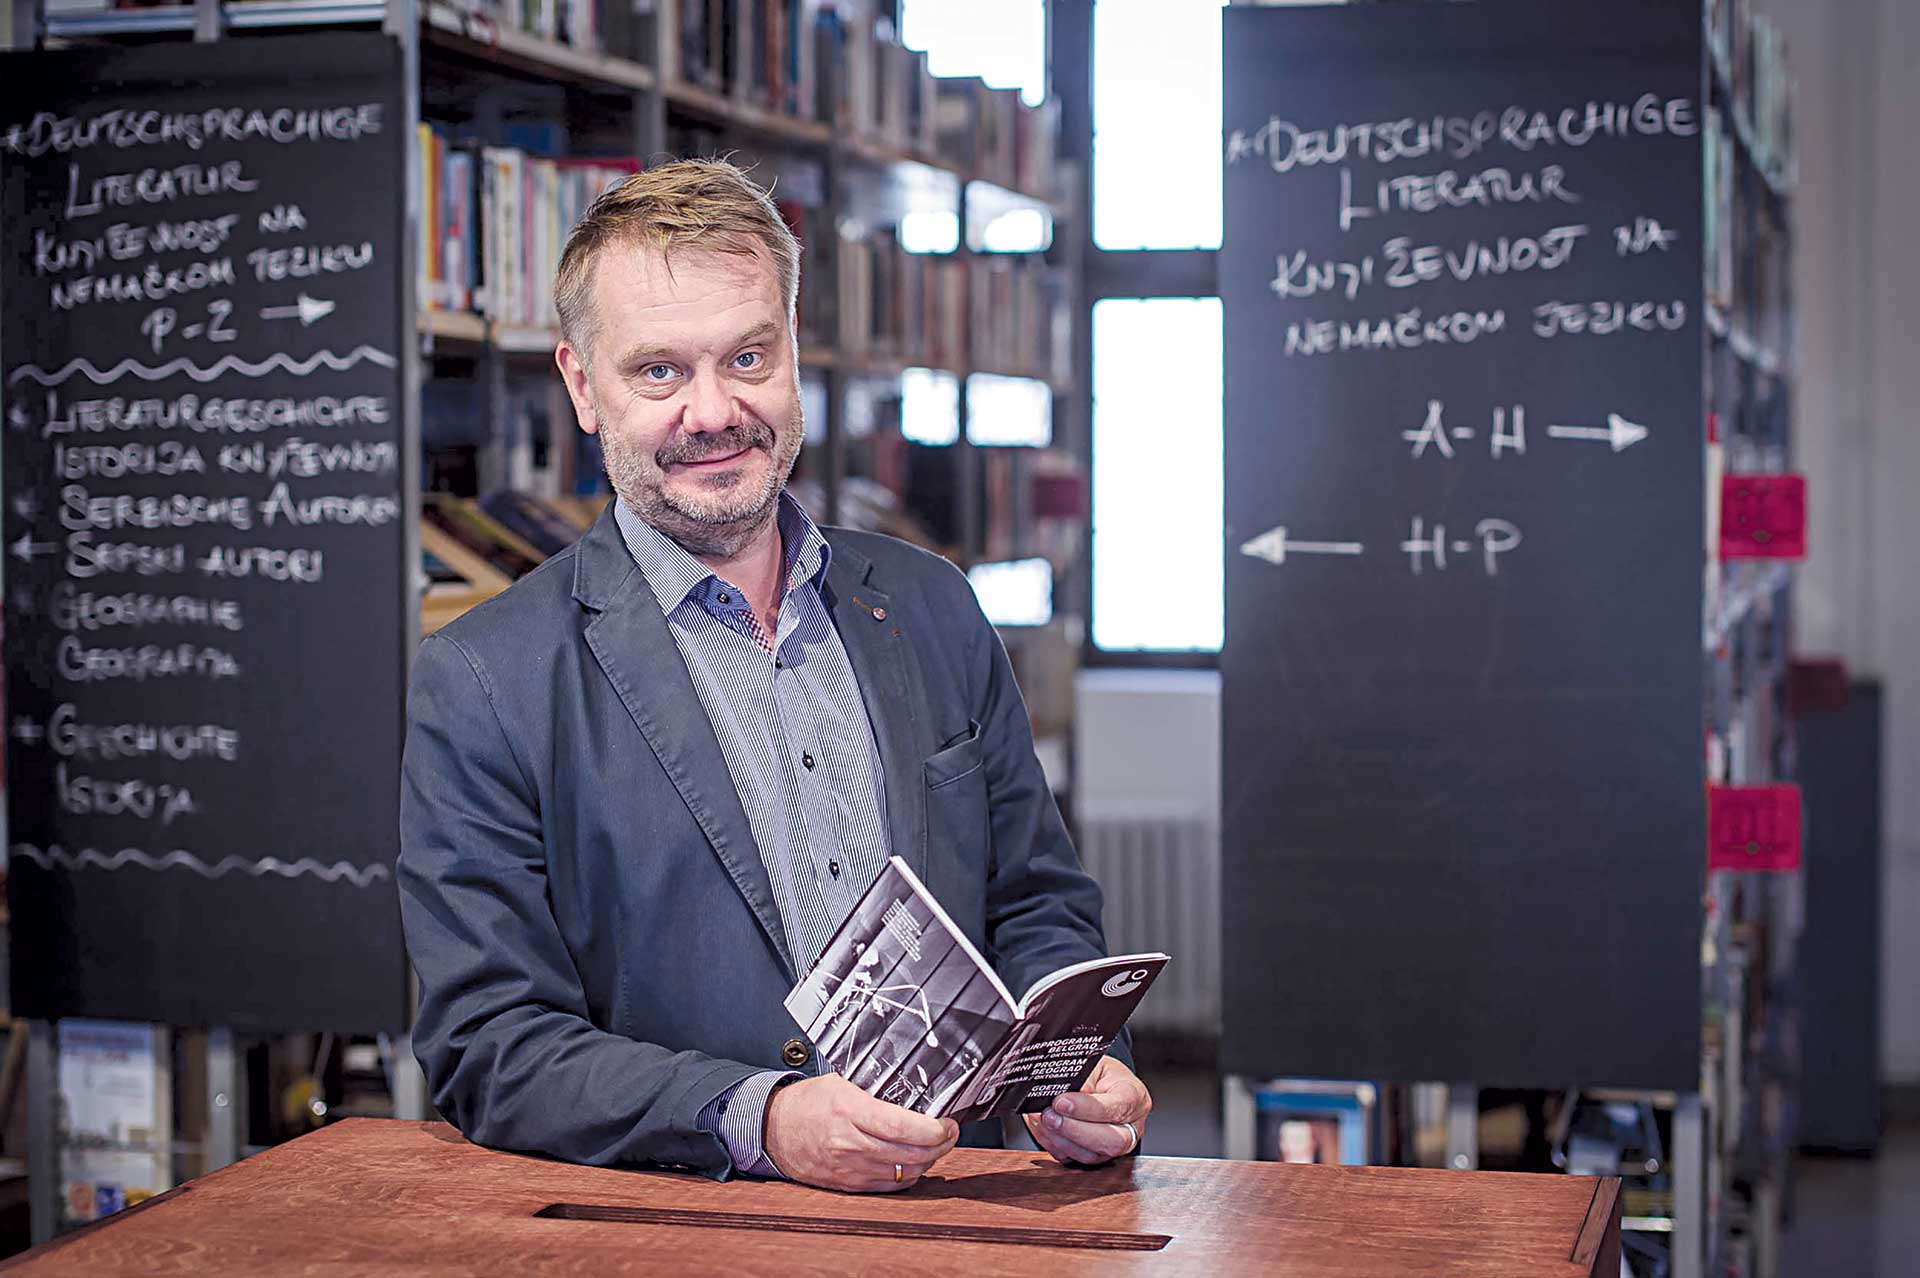 Frank Baumann, Director of Goethe institut Belgrade